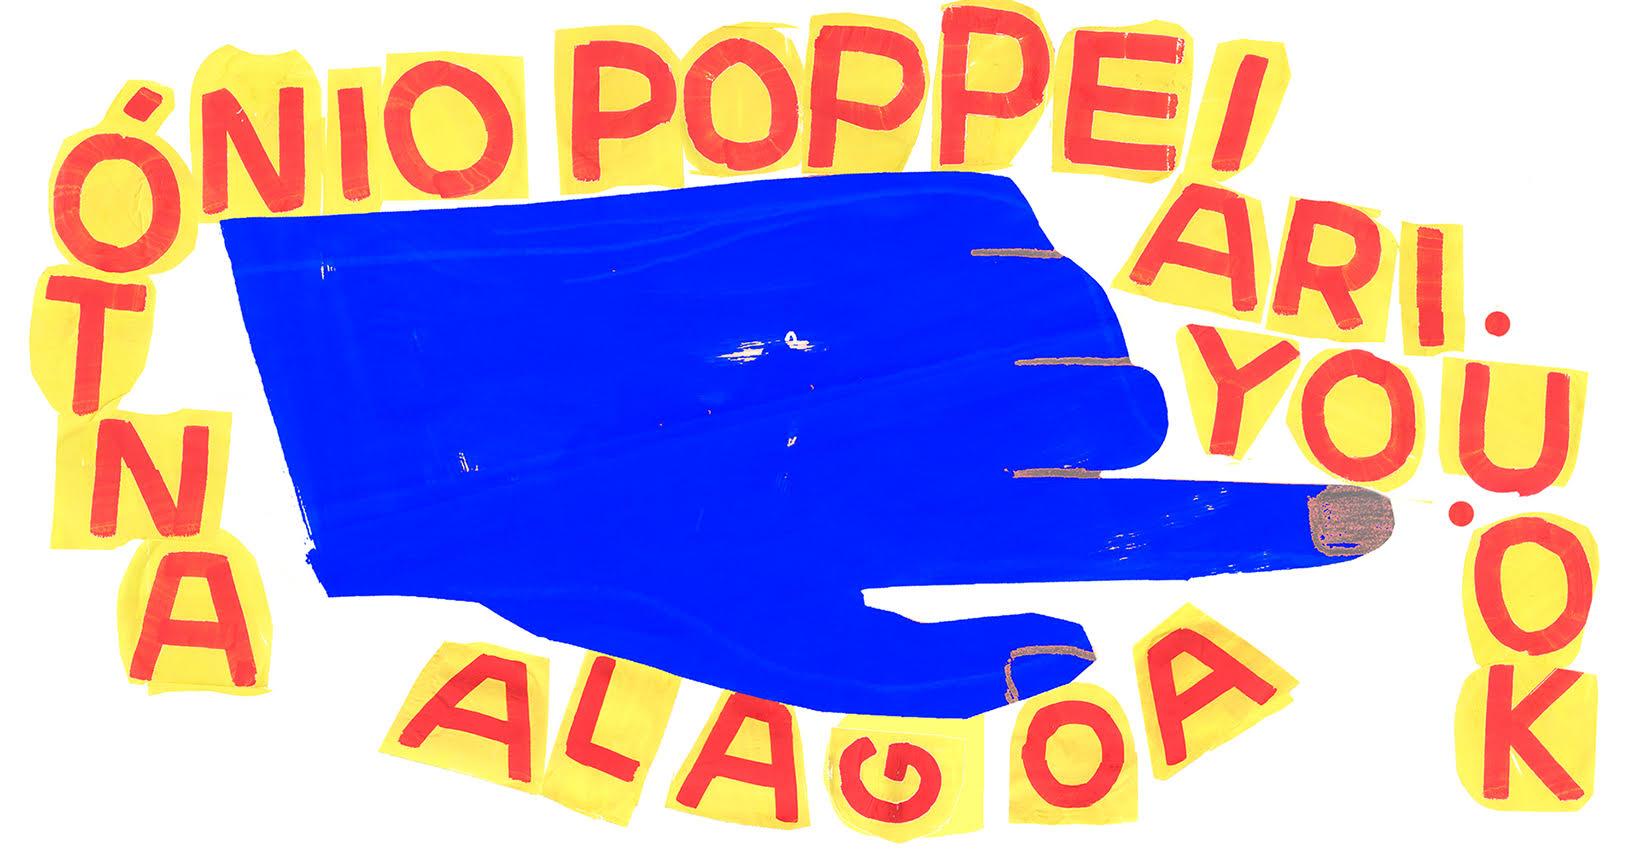 Alagoa   António Poppe . Ariyouok? - 'deslagrimagem / deslagrimargem'